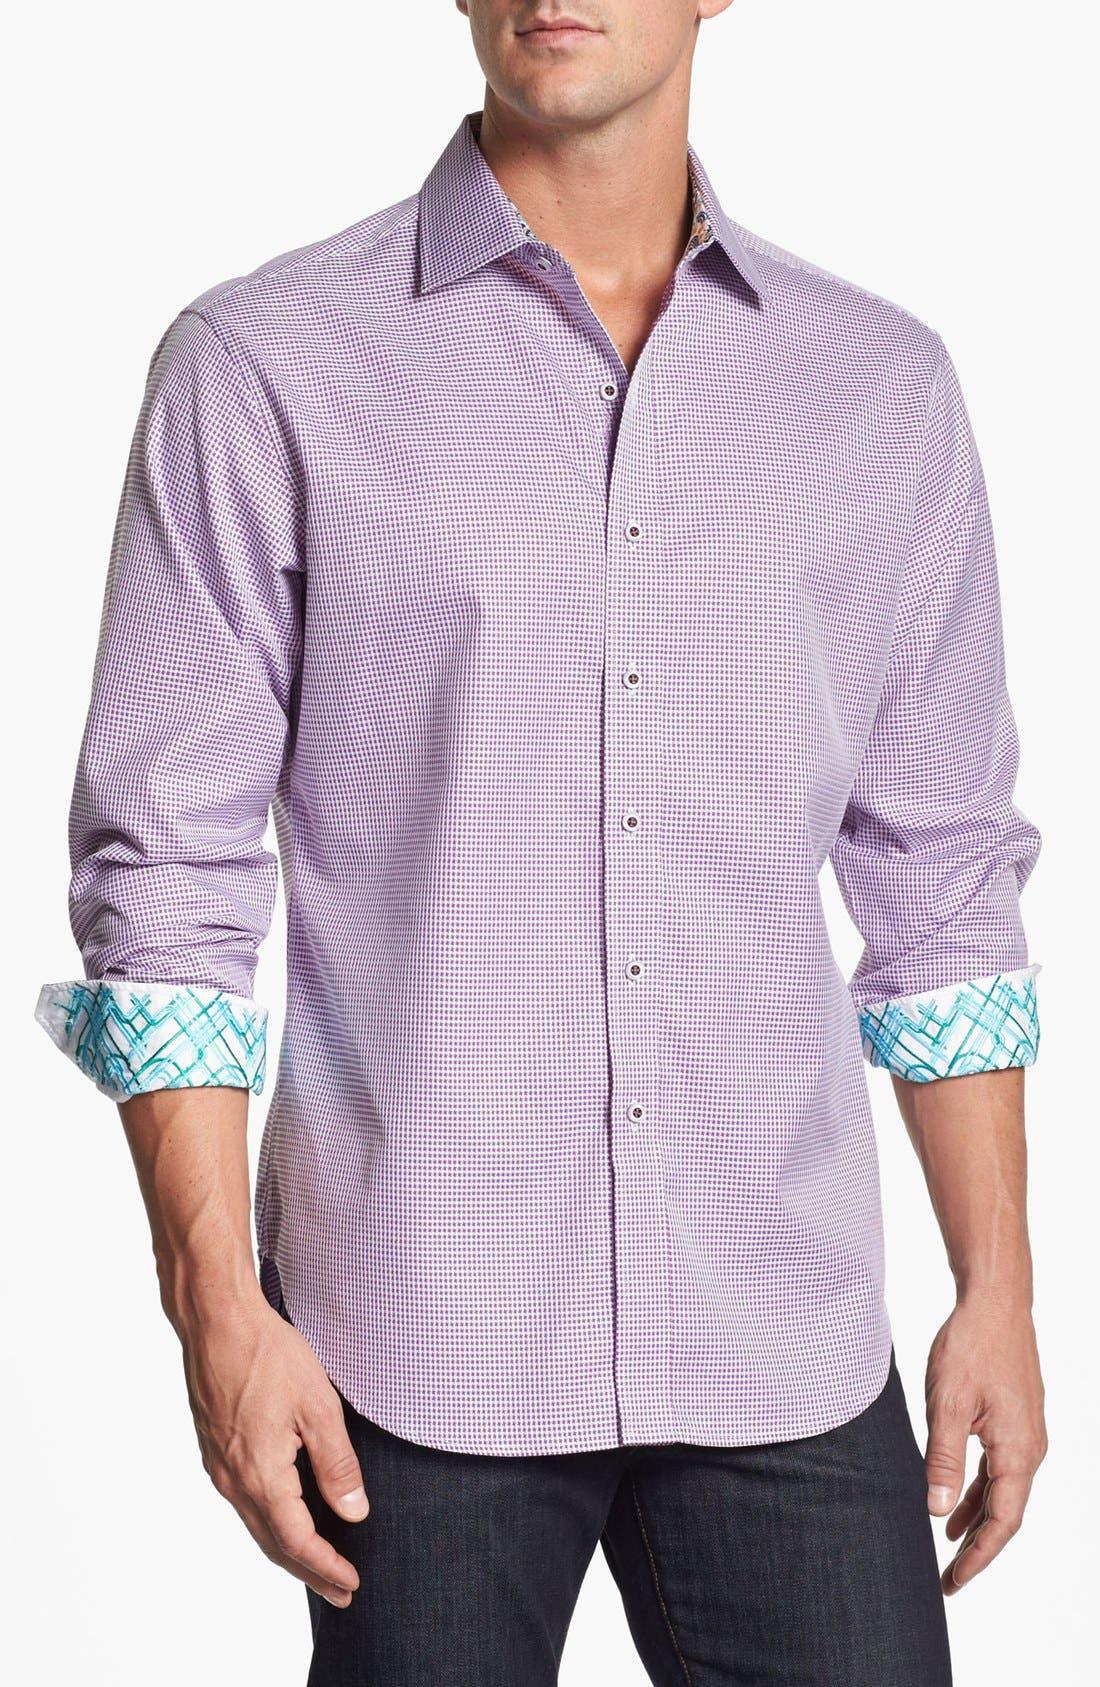 Alternate Image 1 Selected - Robert Graham 'Toulouse' Regular Fit Sport Shirt (Tall)